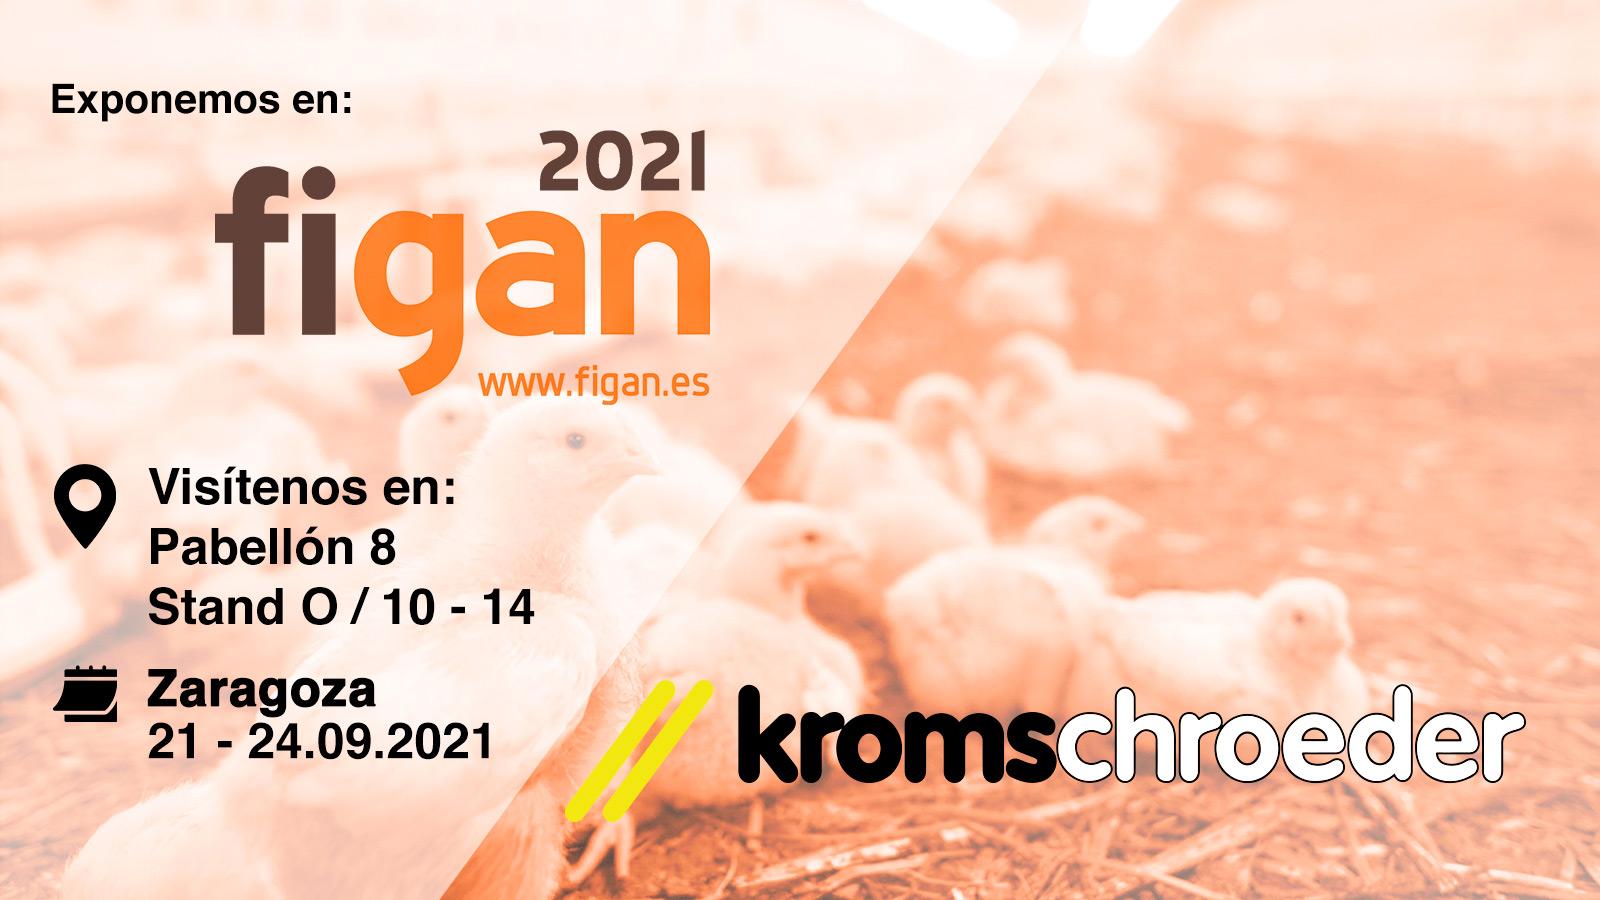 Kromschroeder, FIGAN, agropecuario